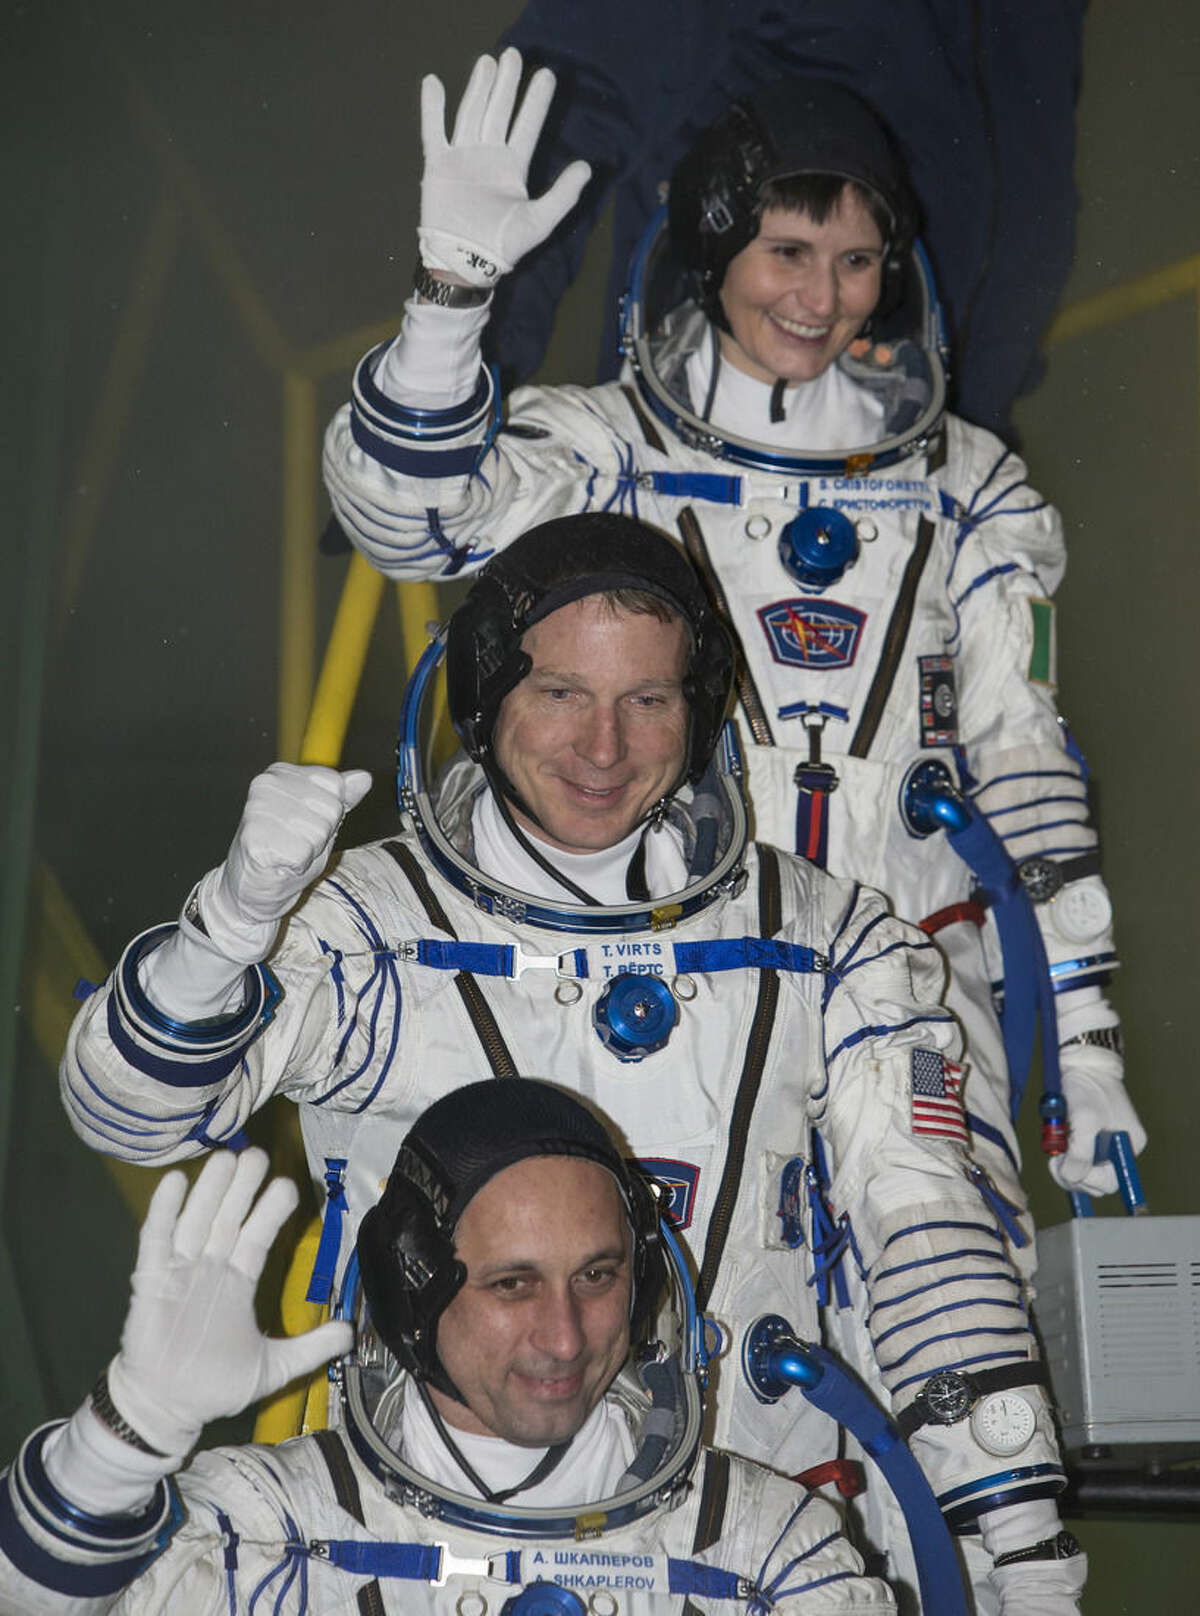 U.S. astronaut Terry Virts, centre, Russian cosmonaut Anton Shkaplerov, bottom, and Italian astronaut Samantha Cristoforetti, crew members of the mission to the International Space Station, ISS, gesture prior the launch of Soyuz-FG rocket at the Russian leased Baikonur cosmodrome, Kazakhstan, Monday, Nov. 24, 2014. (AP Photo/Shamil Zhumatov, Pool)